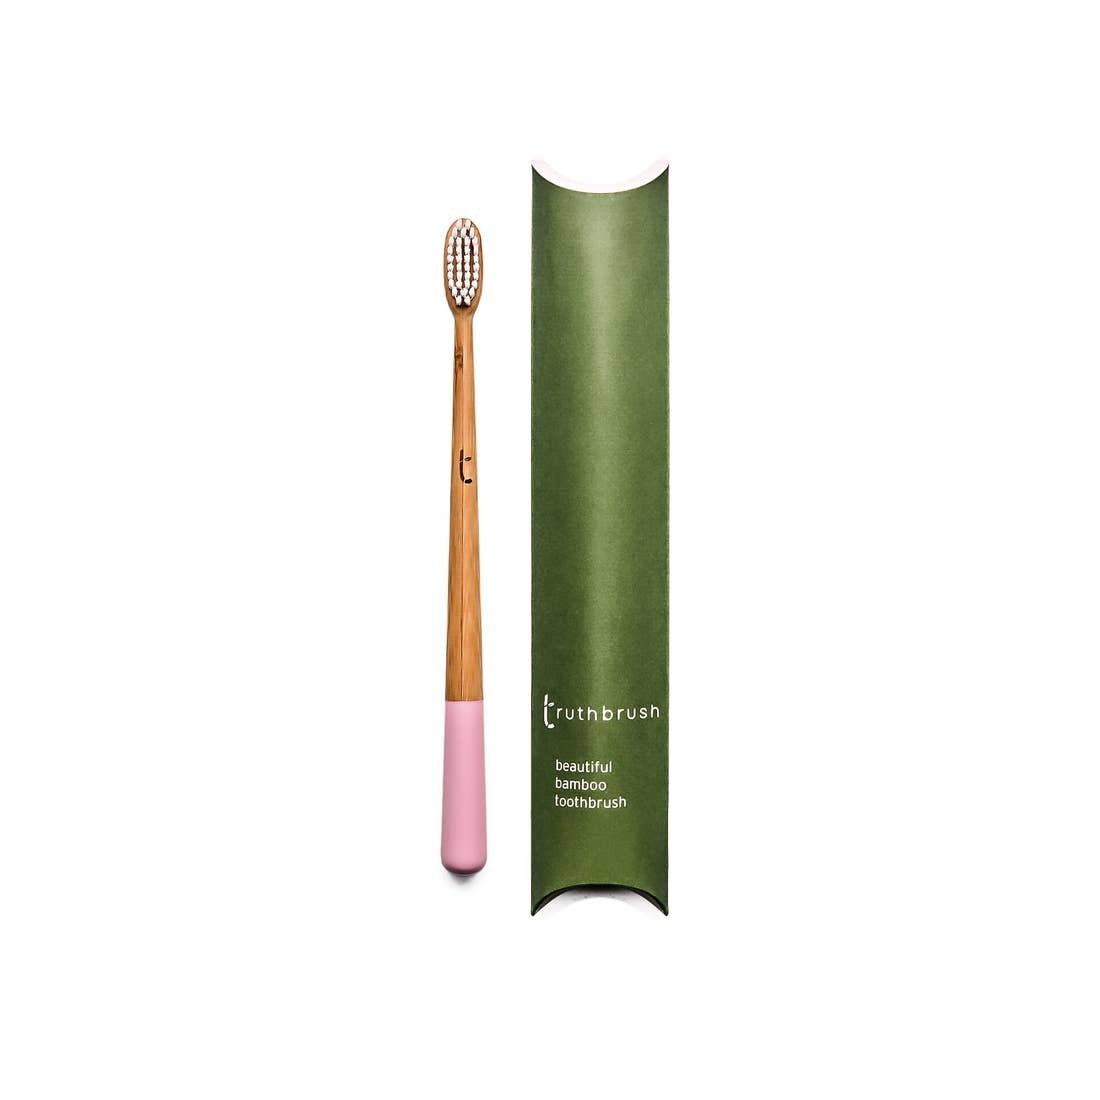 Truthbrush Ltd Adult Bristle Truthbrush - Medium - Pink